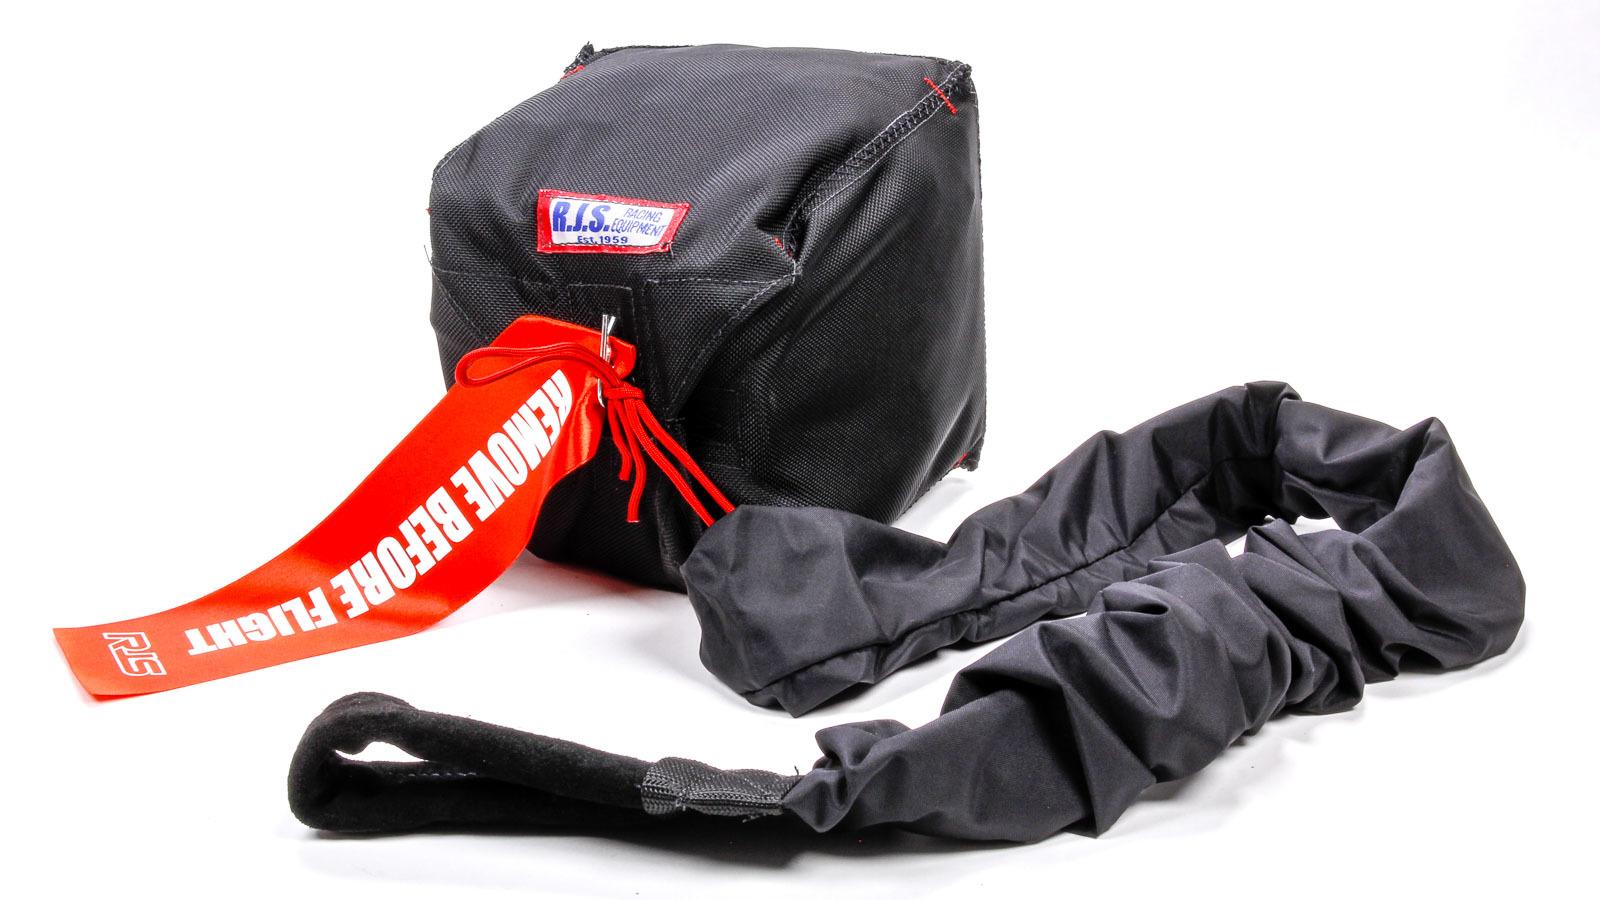 Rjs Safety Qualifier Chute W/ Nylon Bag and Pilot Black